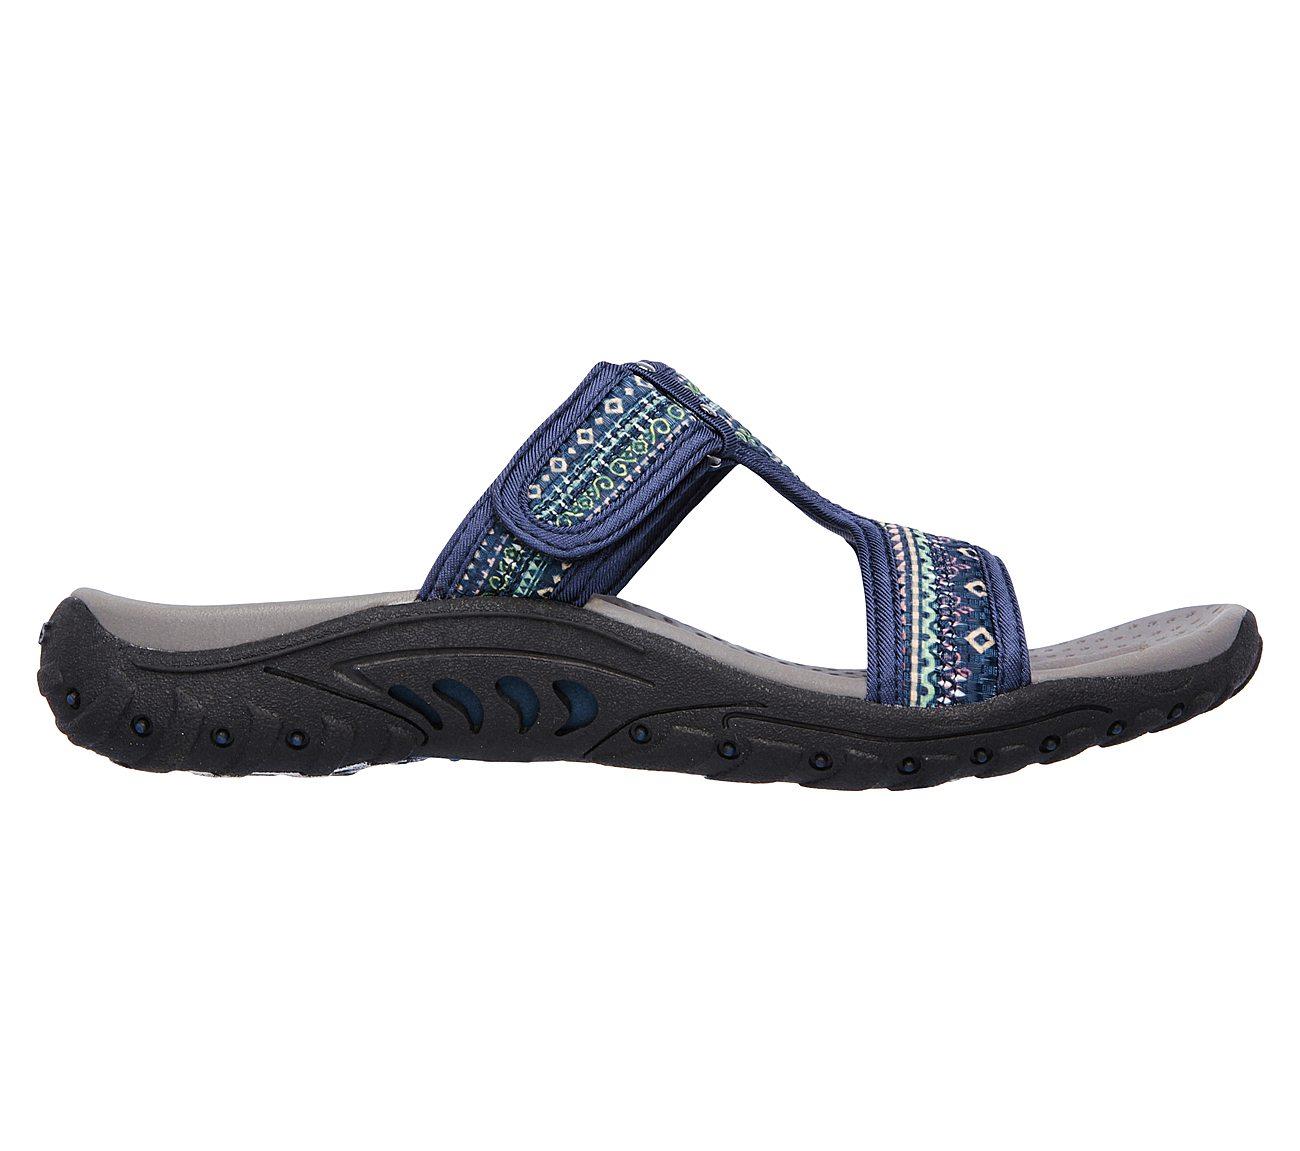 skechers slippers usa